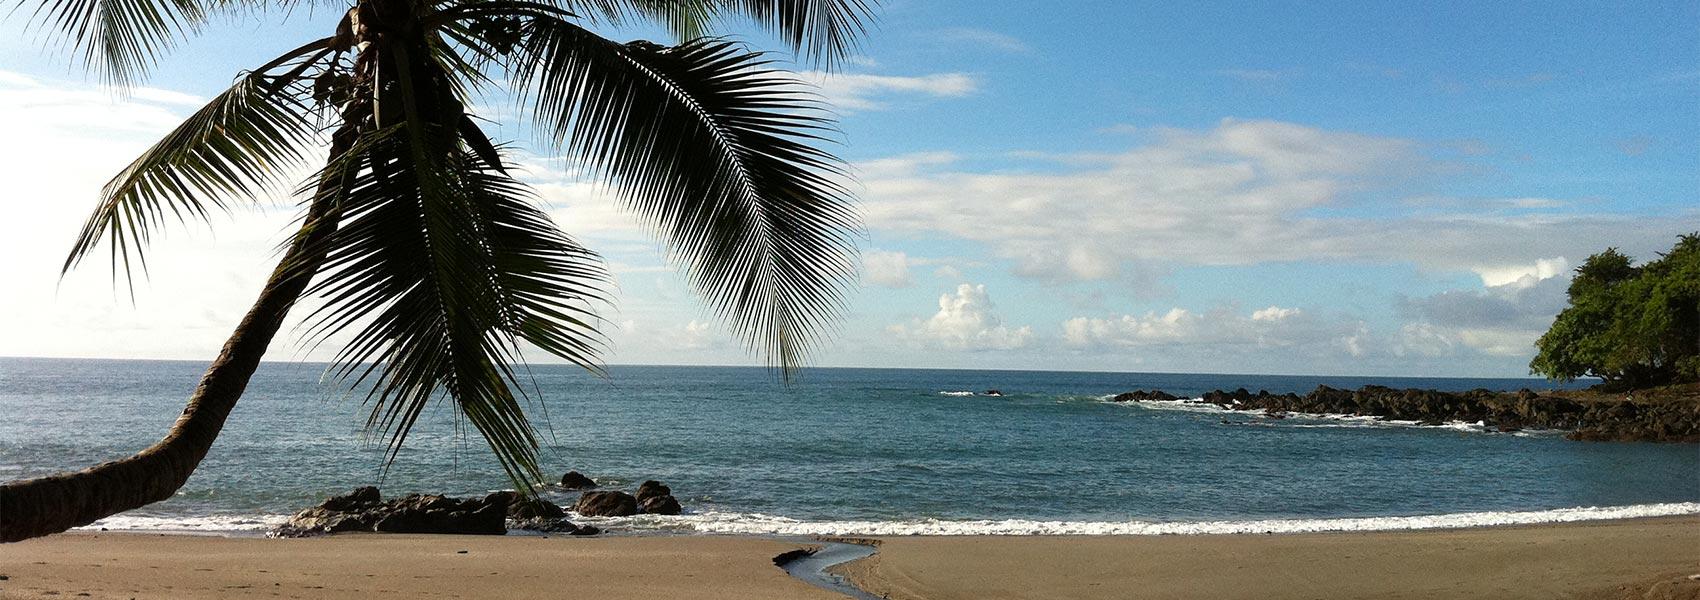 Malpais beaches boast of great surf and sunsets.